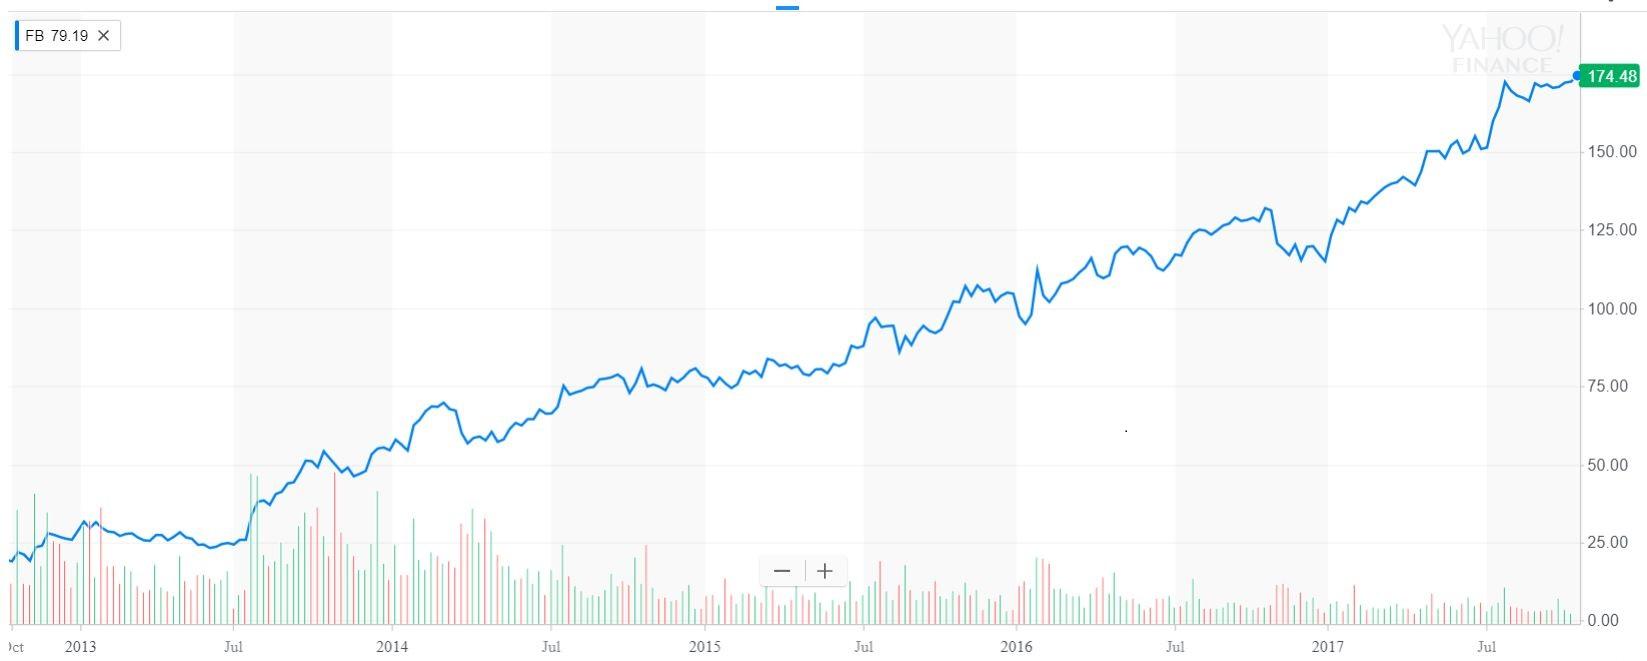 Facebook 5 Year Chart